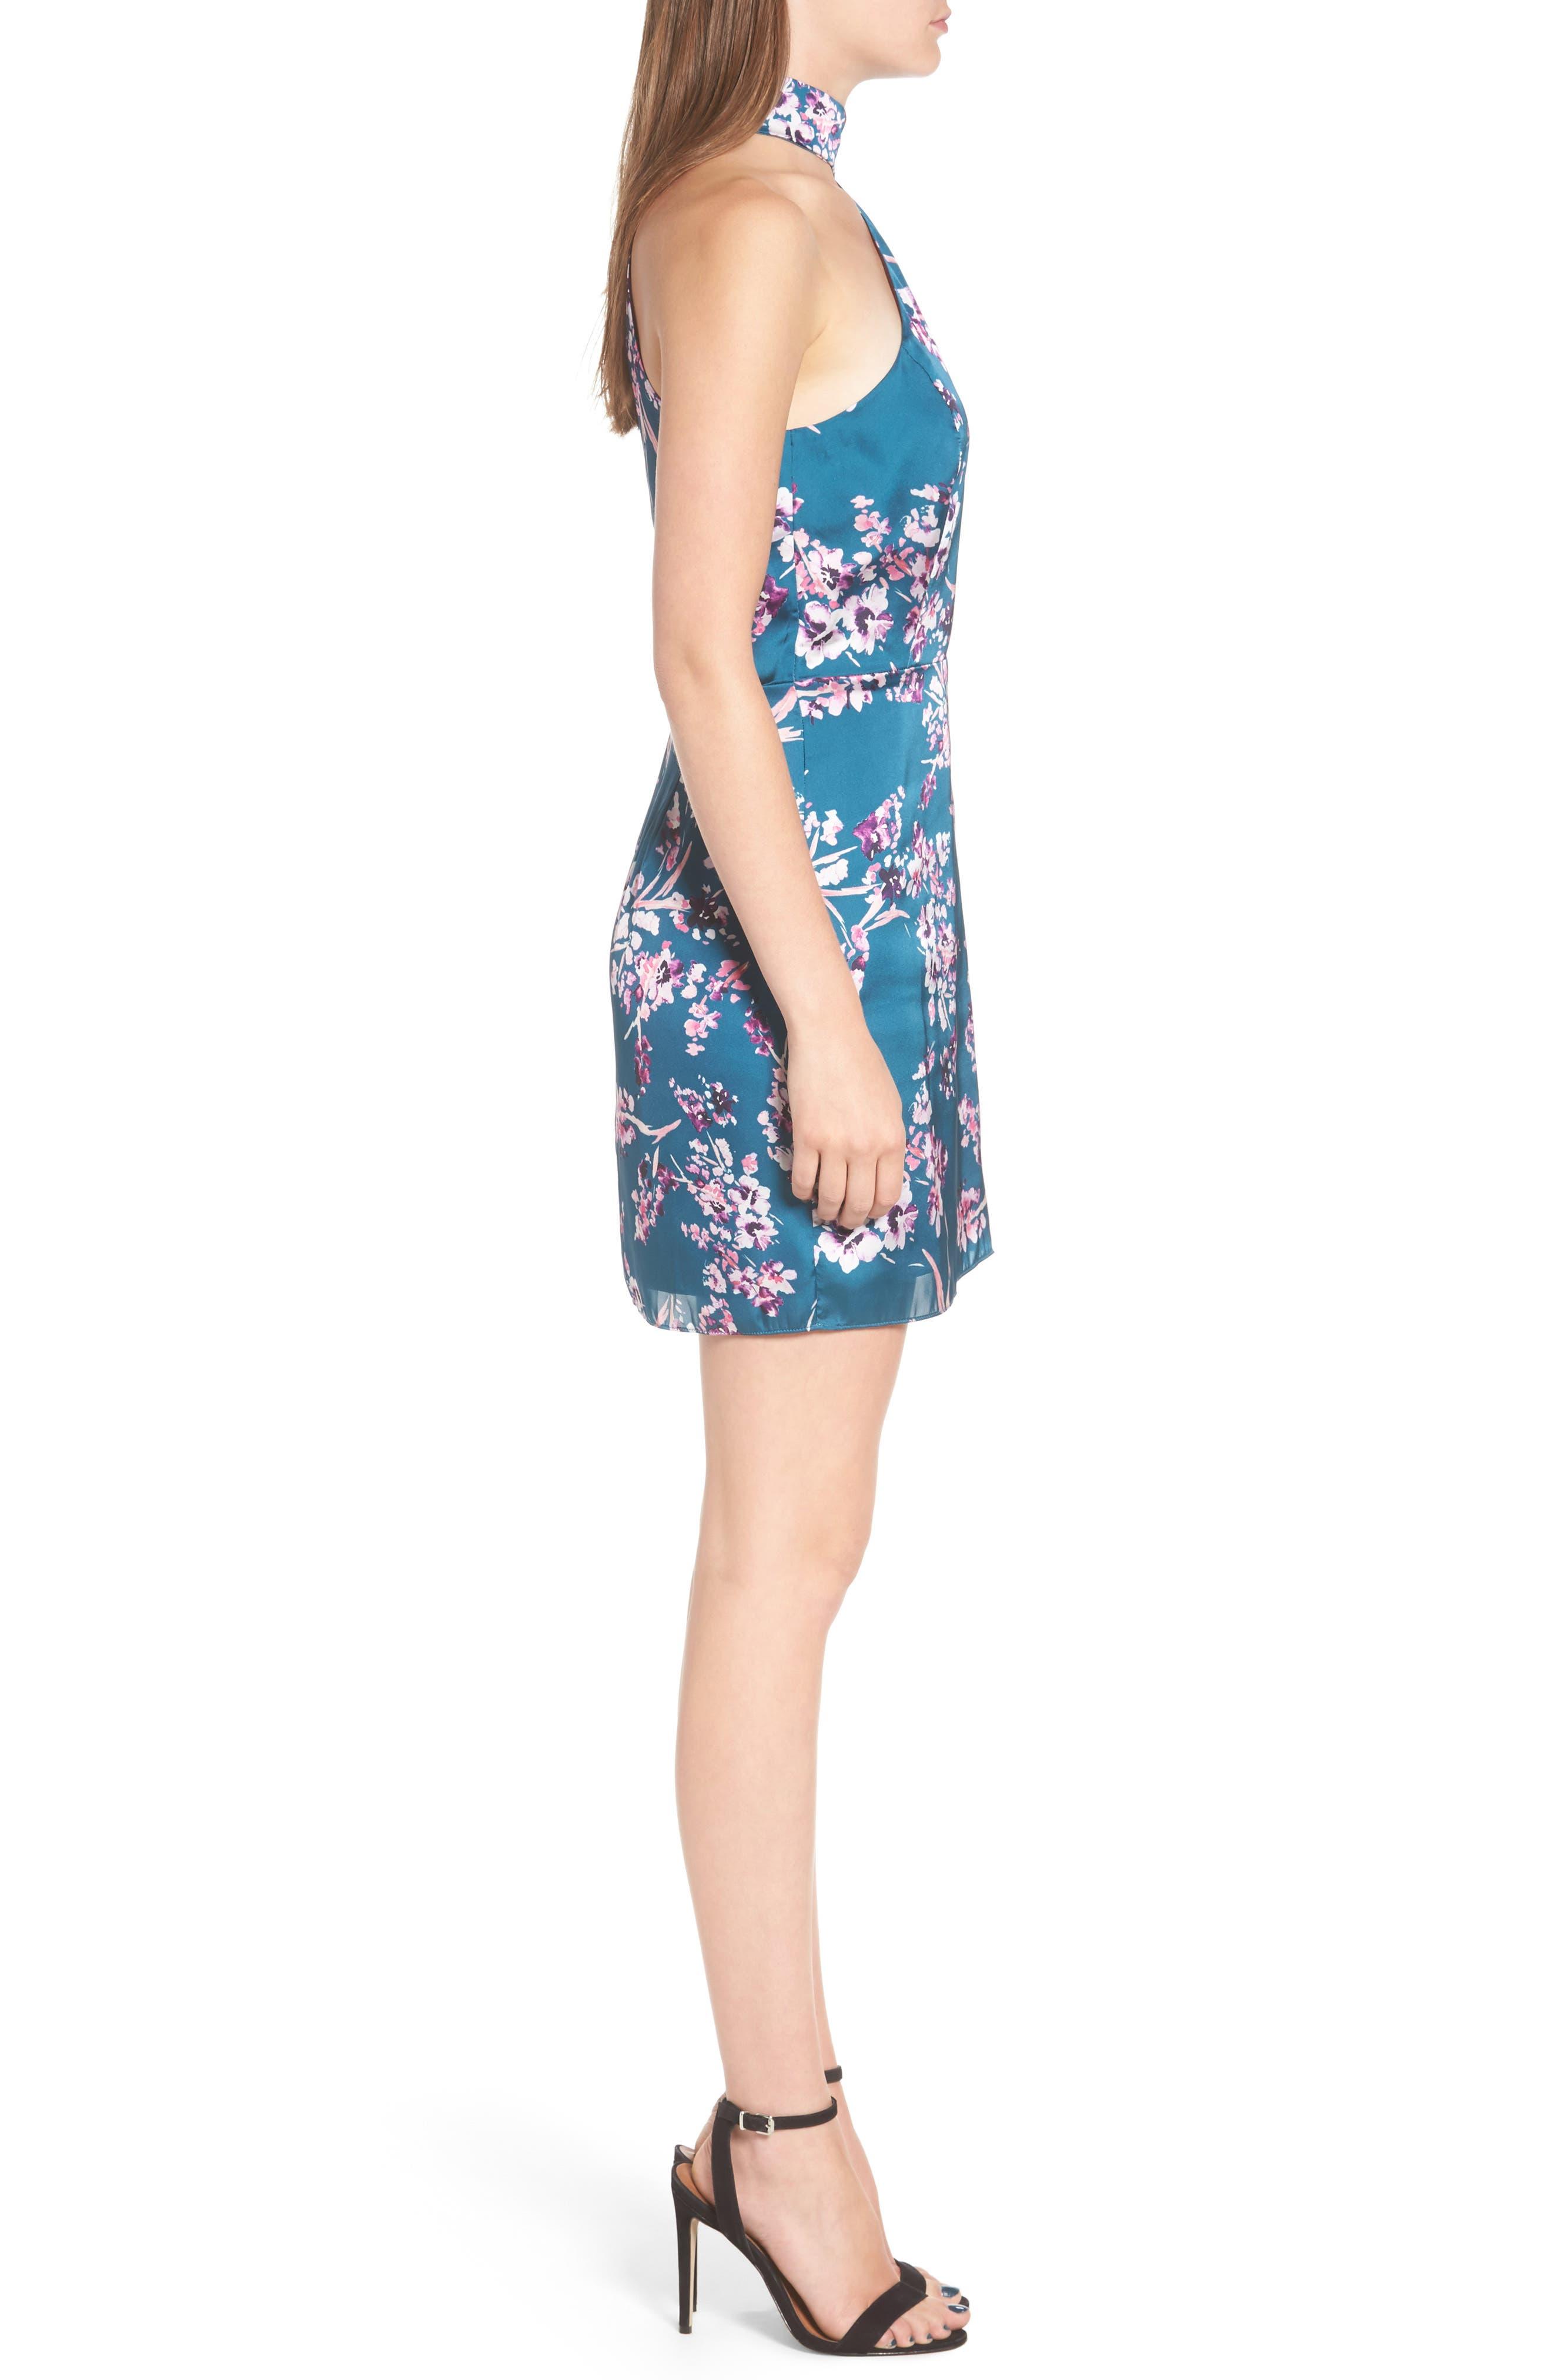 Clover Cold Shoulder Sheath Dress,                             Alternate thumbnail 3, color,                             Moroccan Blossom